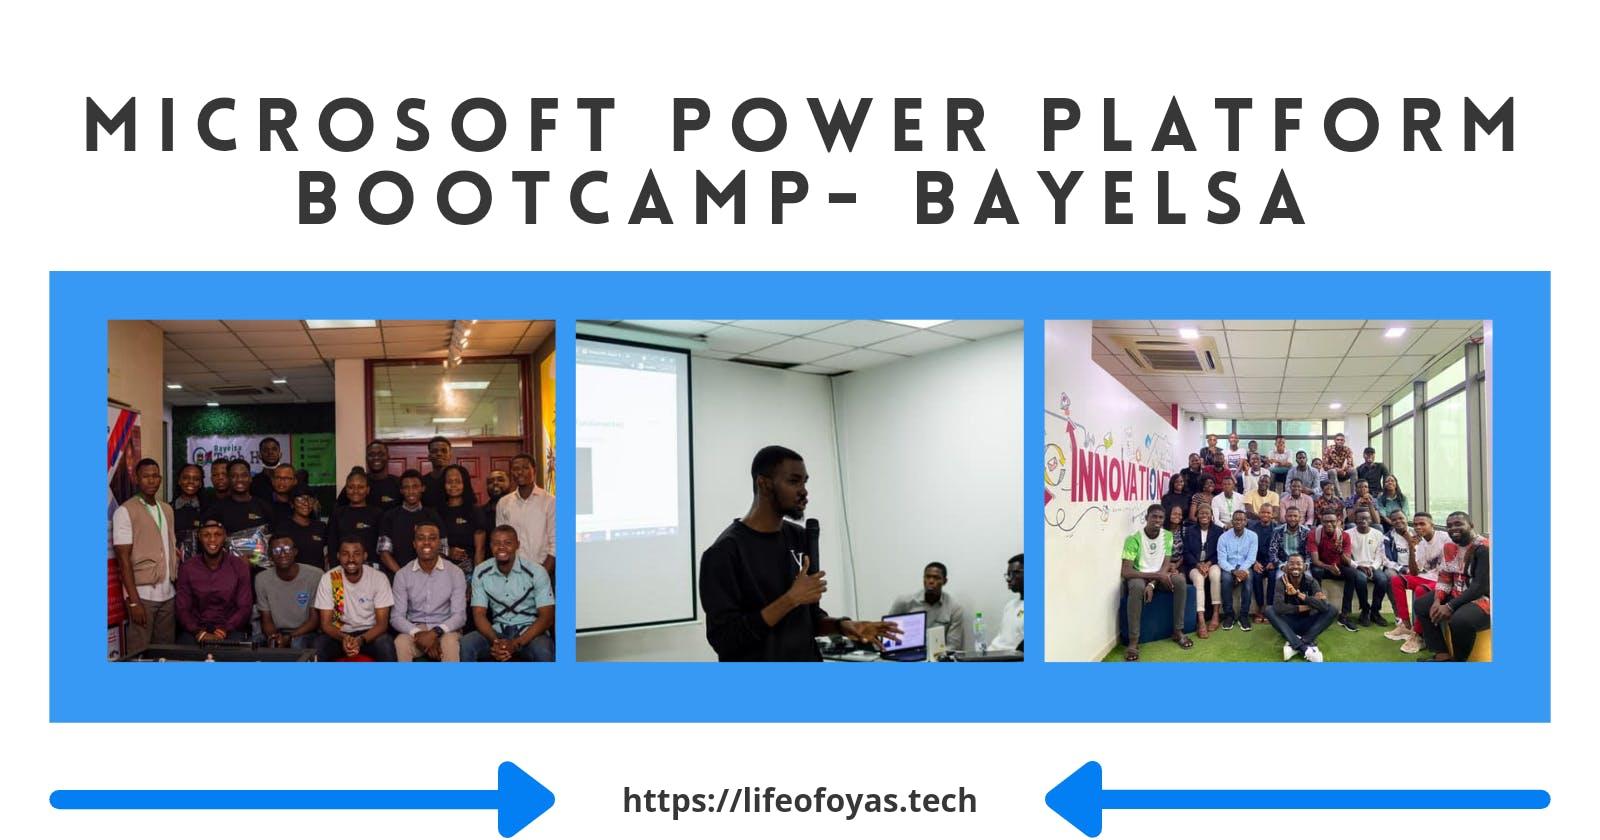 Microsoft Power Platform Bootcamp - Bayelsa